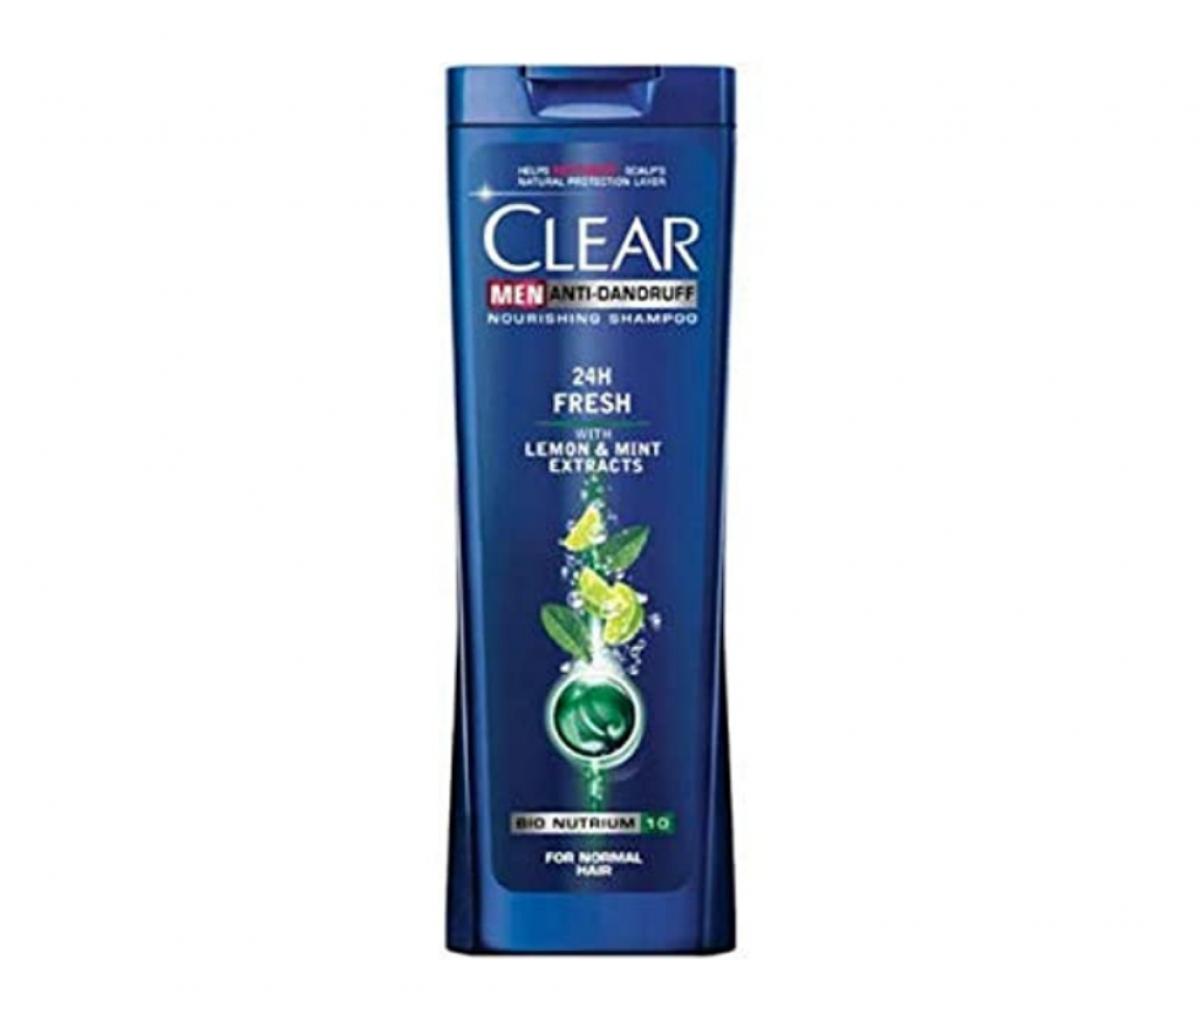 Clear Anti Dandruf 24h Fresh (Men) Shampoo 250ml